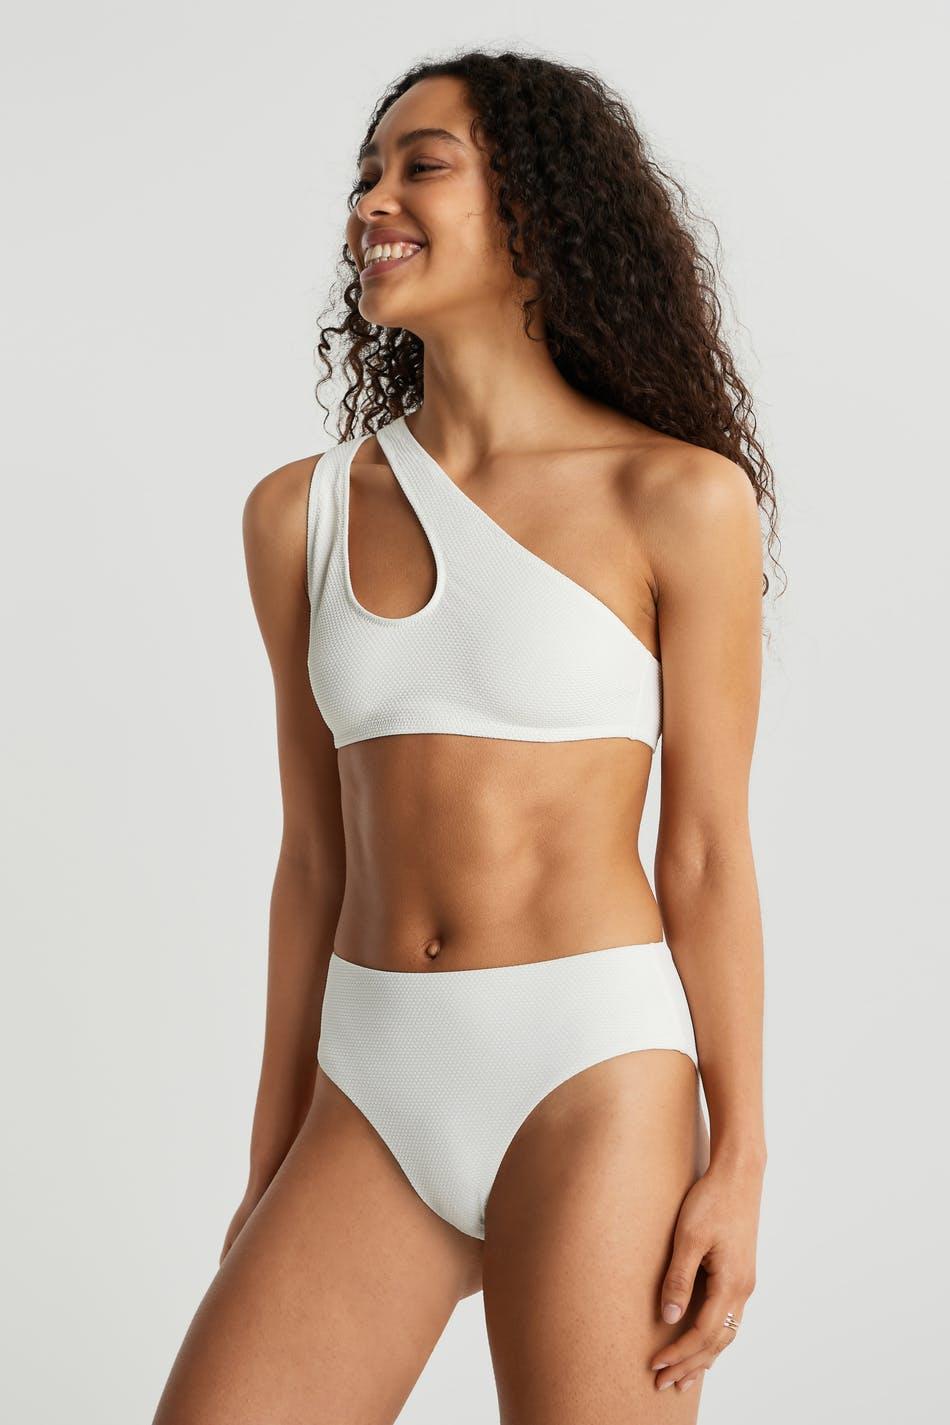 Gina Tricot Nina highwaist bikini brief S Female Cloud dancer (1062)